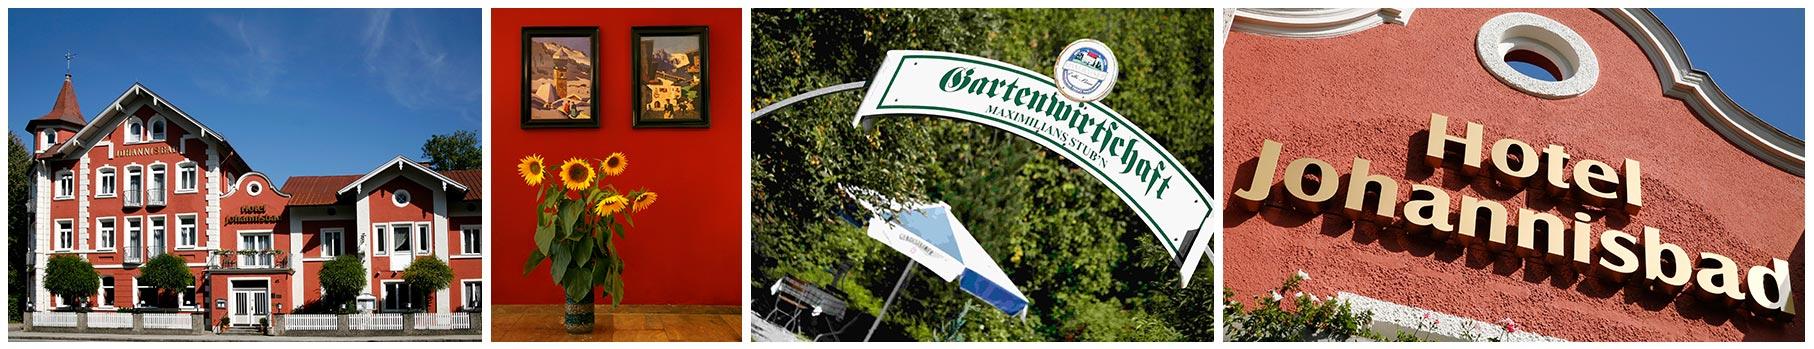 Hotel-Bad-Johannisbad-Das-Hotel